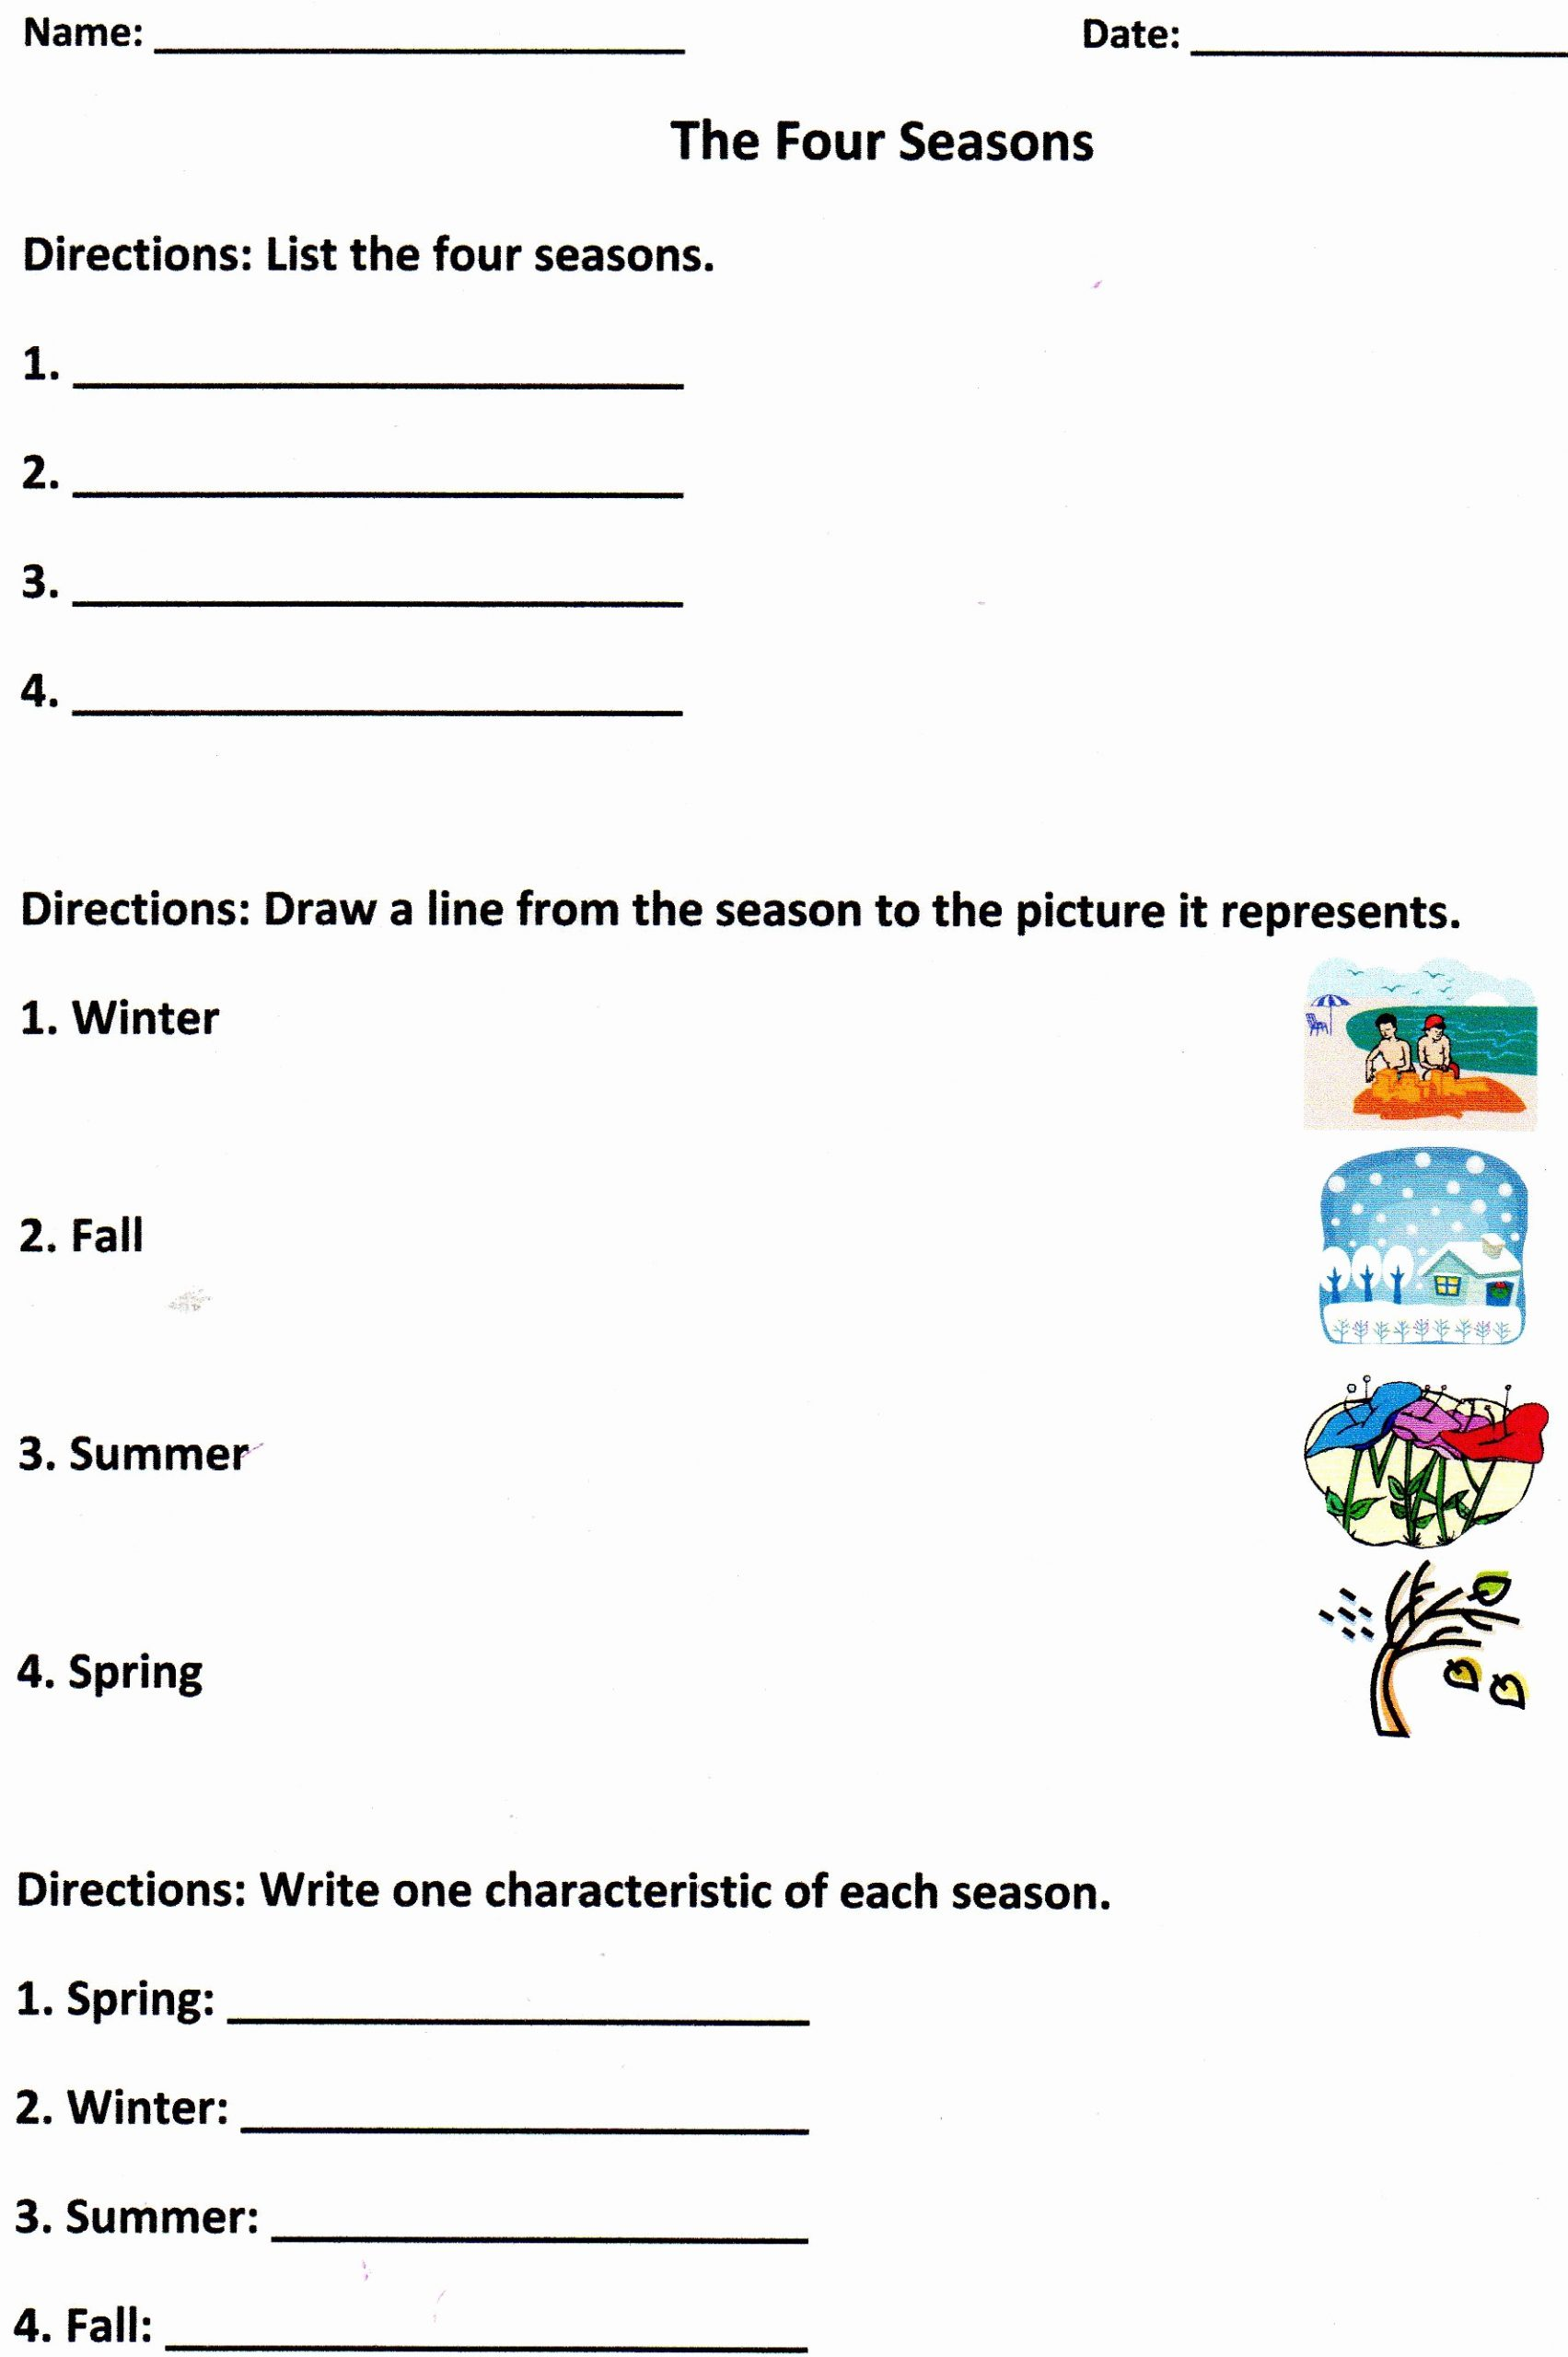 Seasons Worksheets for First Grade New the Four Seasons assessment for K 1